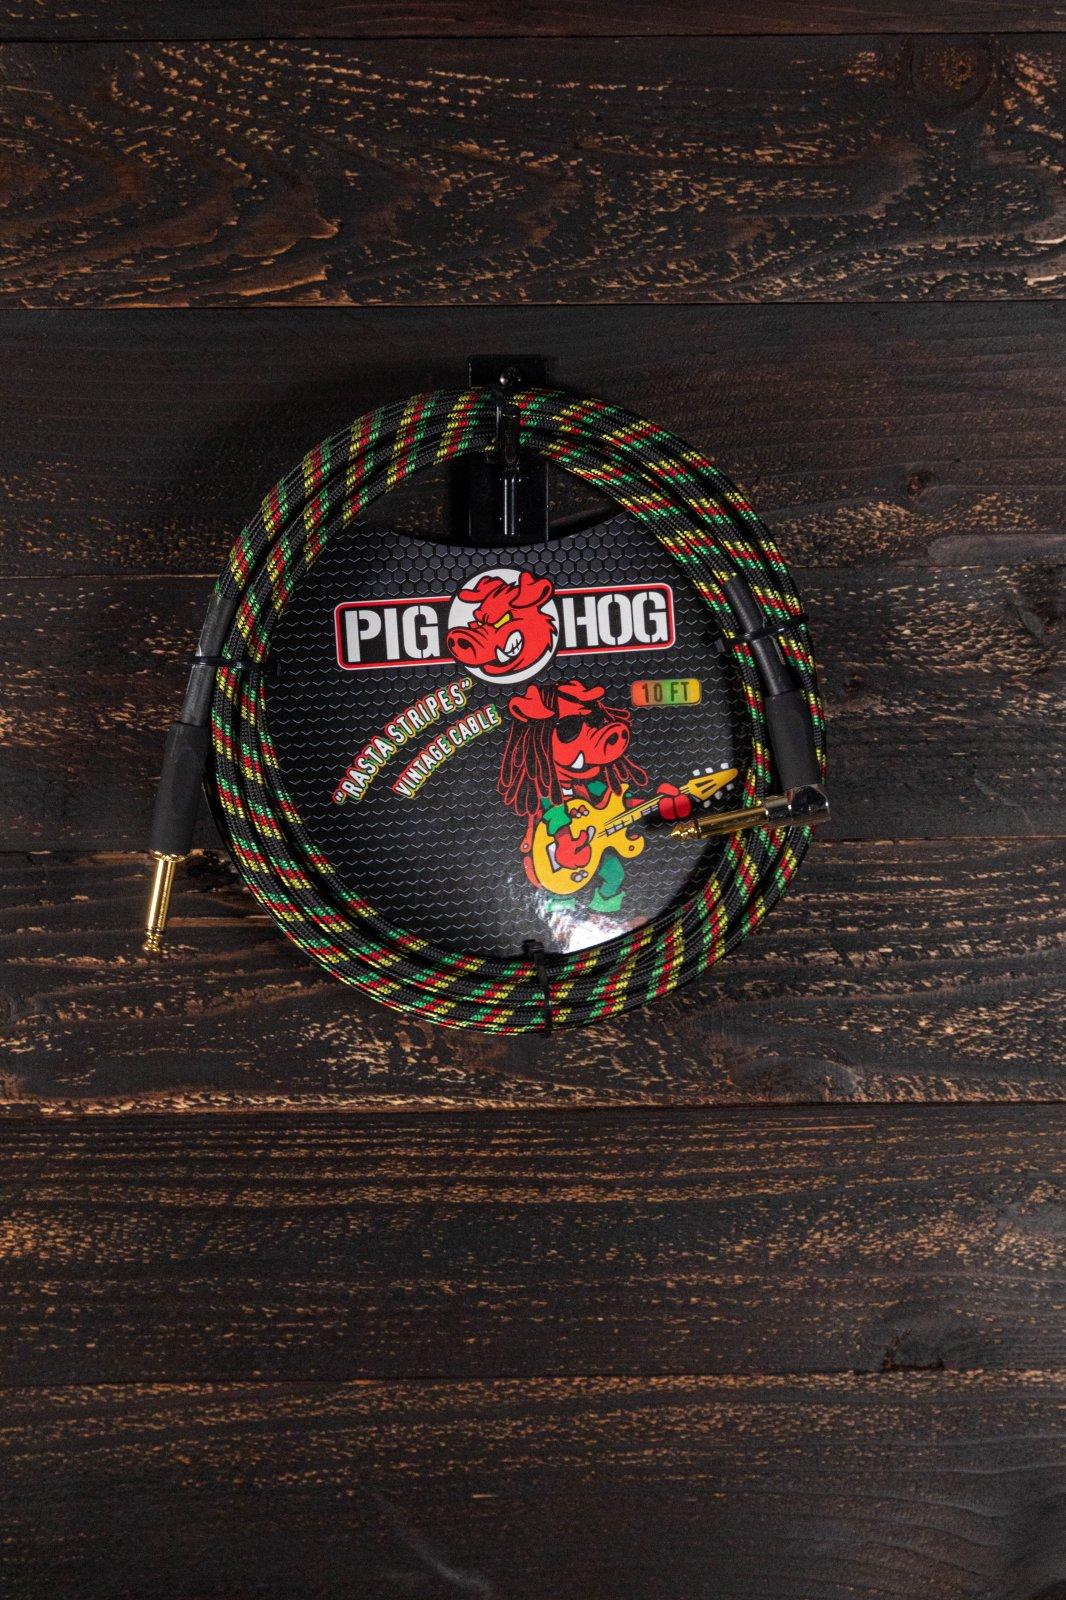 Pig Hog 10ft Rasta Stripes Right Angle Instrument Cable